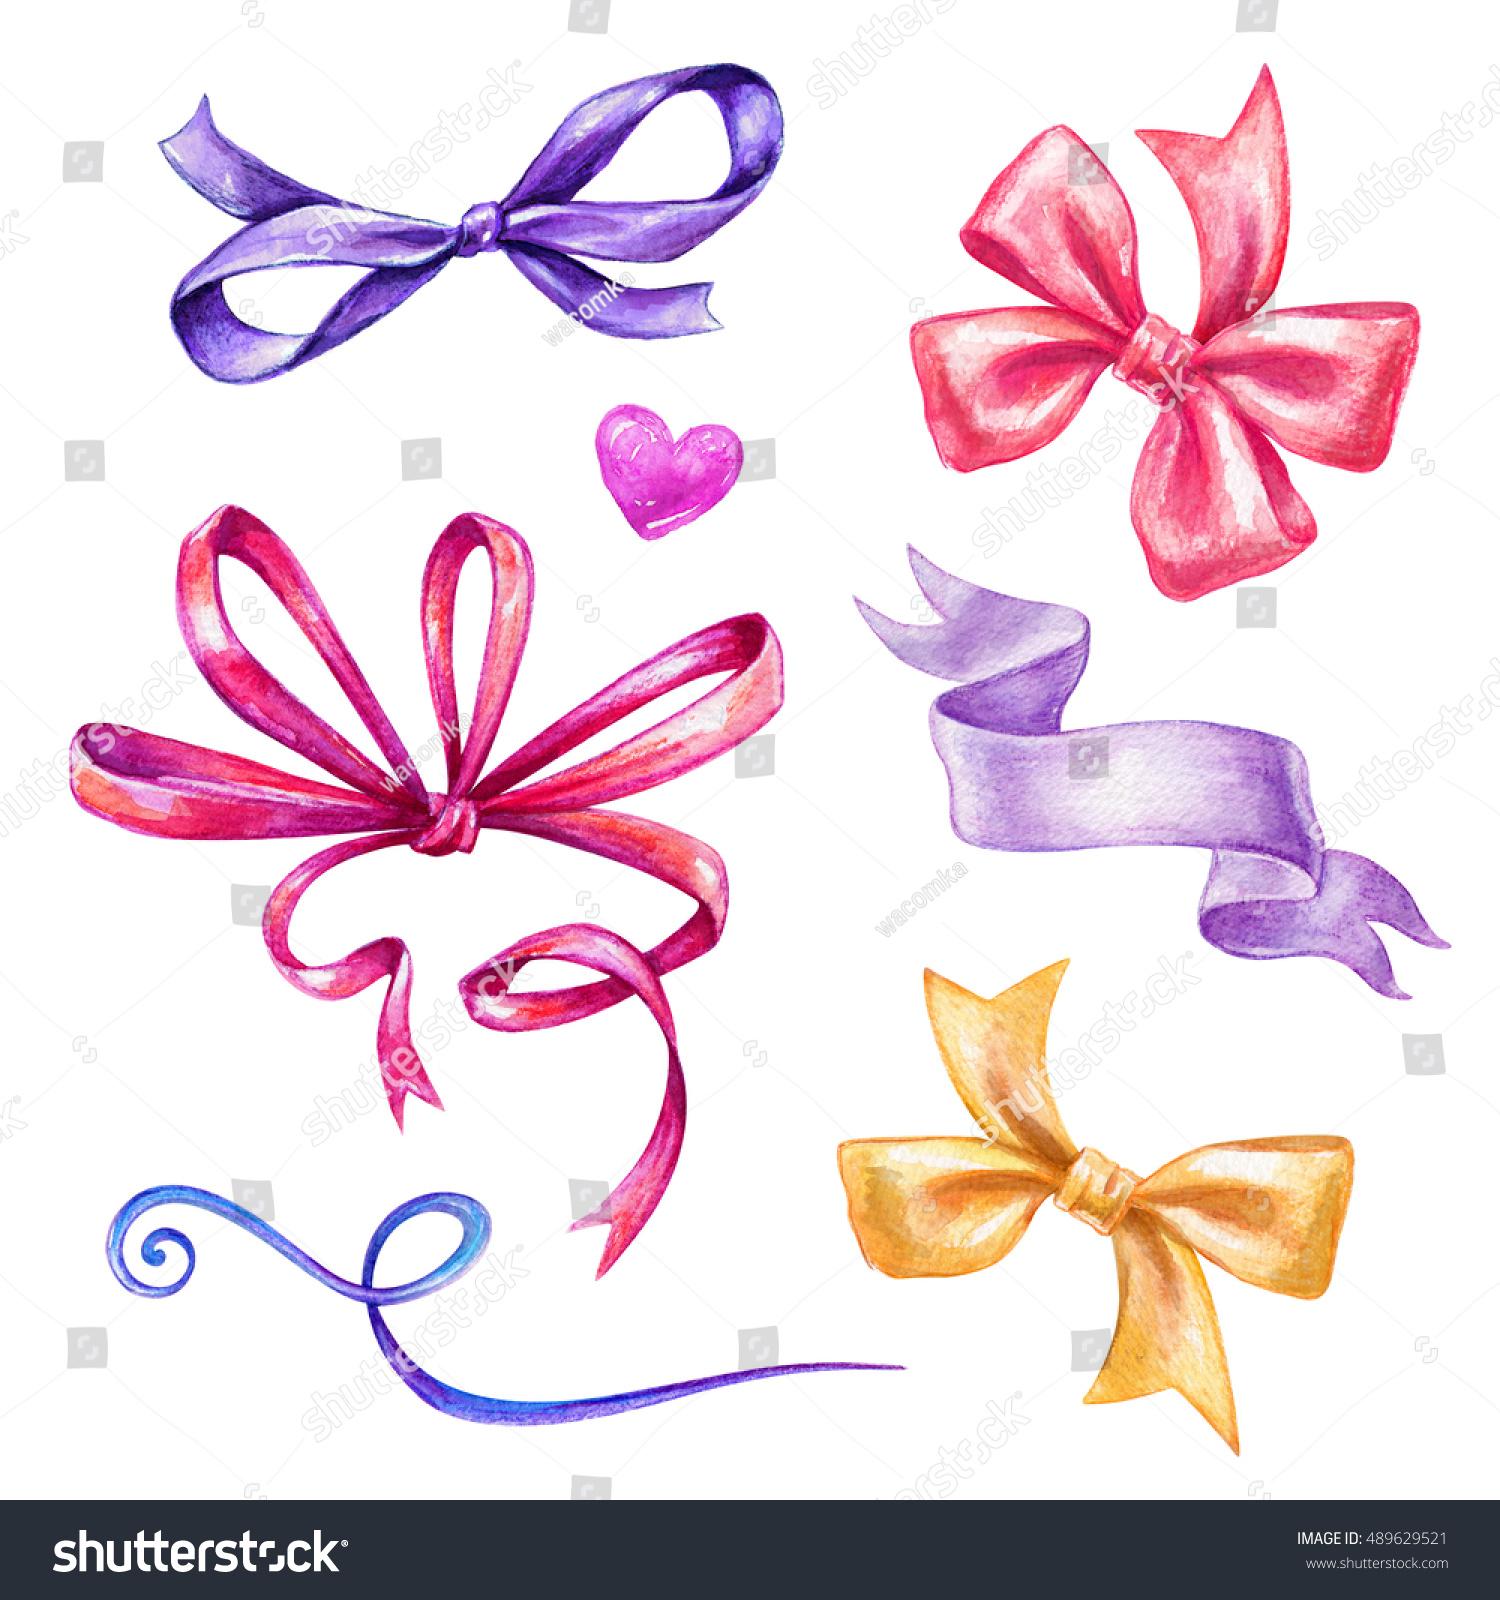 Watercolor Holiday Ribbon Bow Illustration Festive Stock